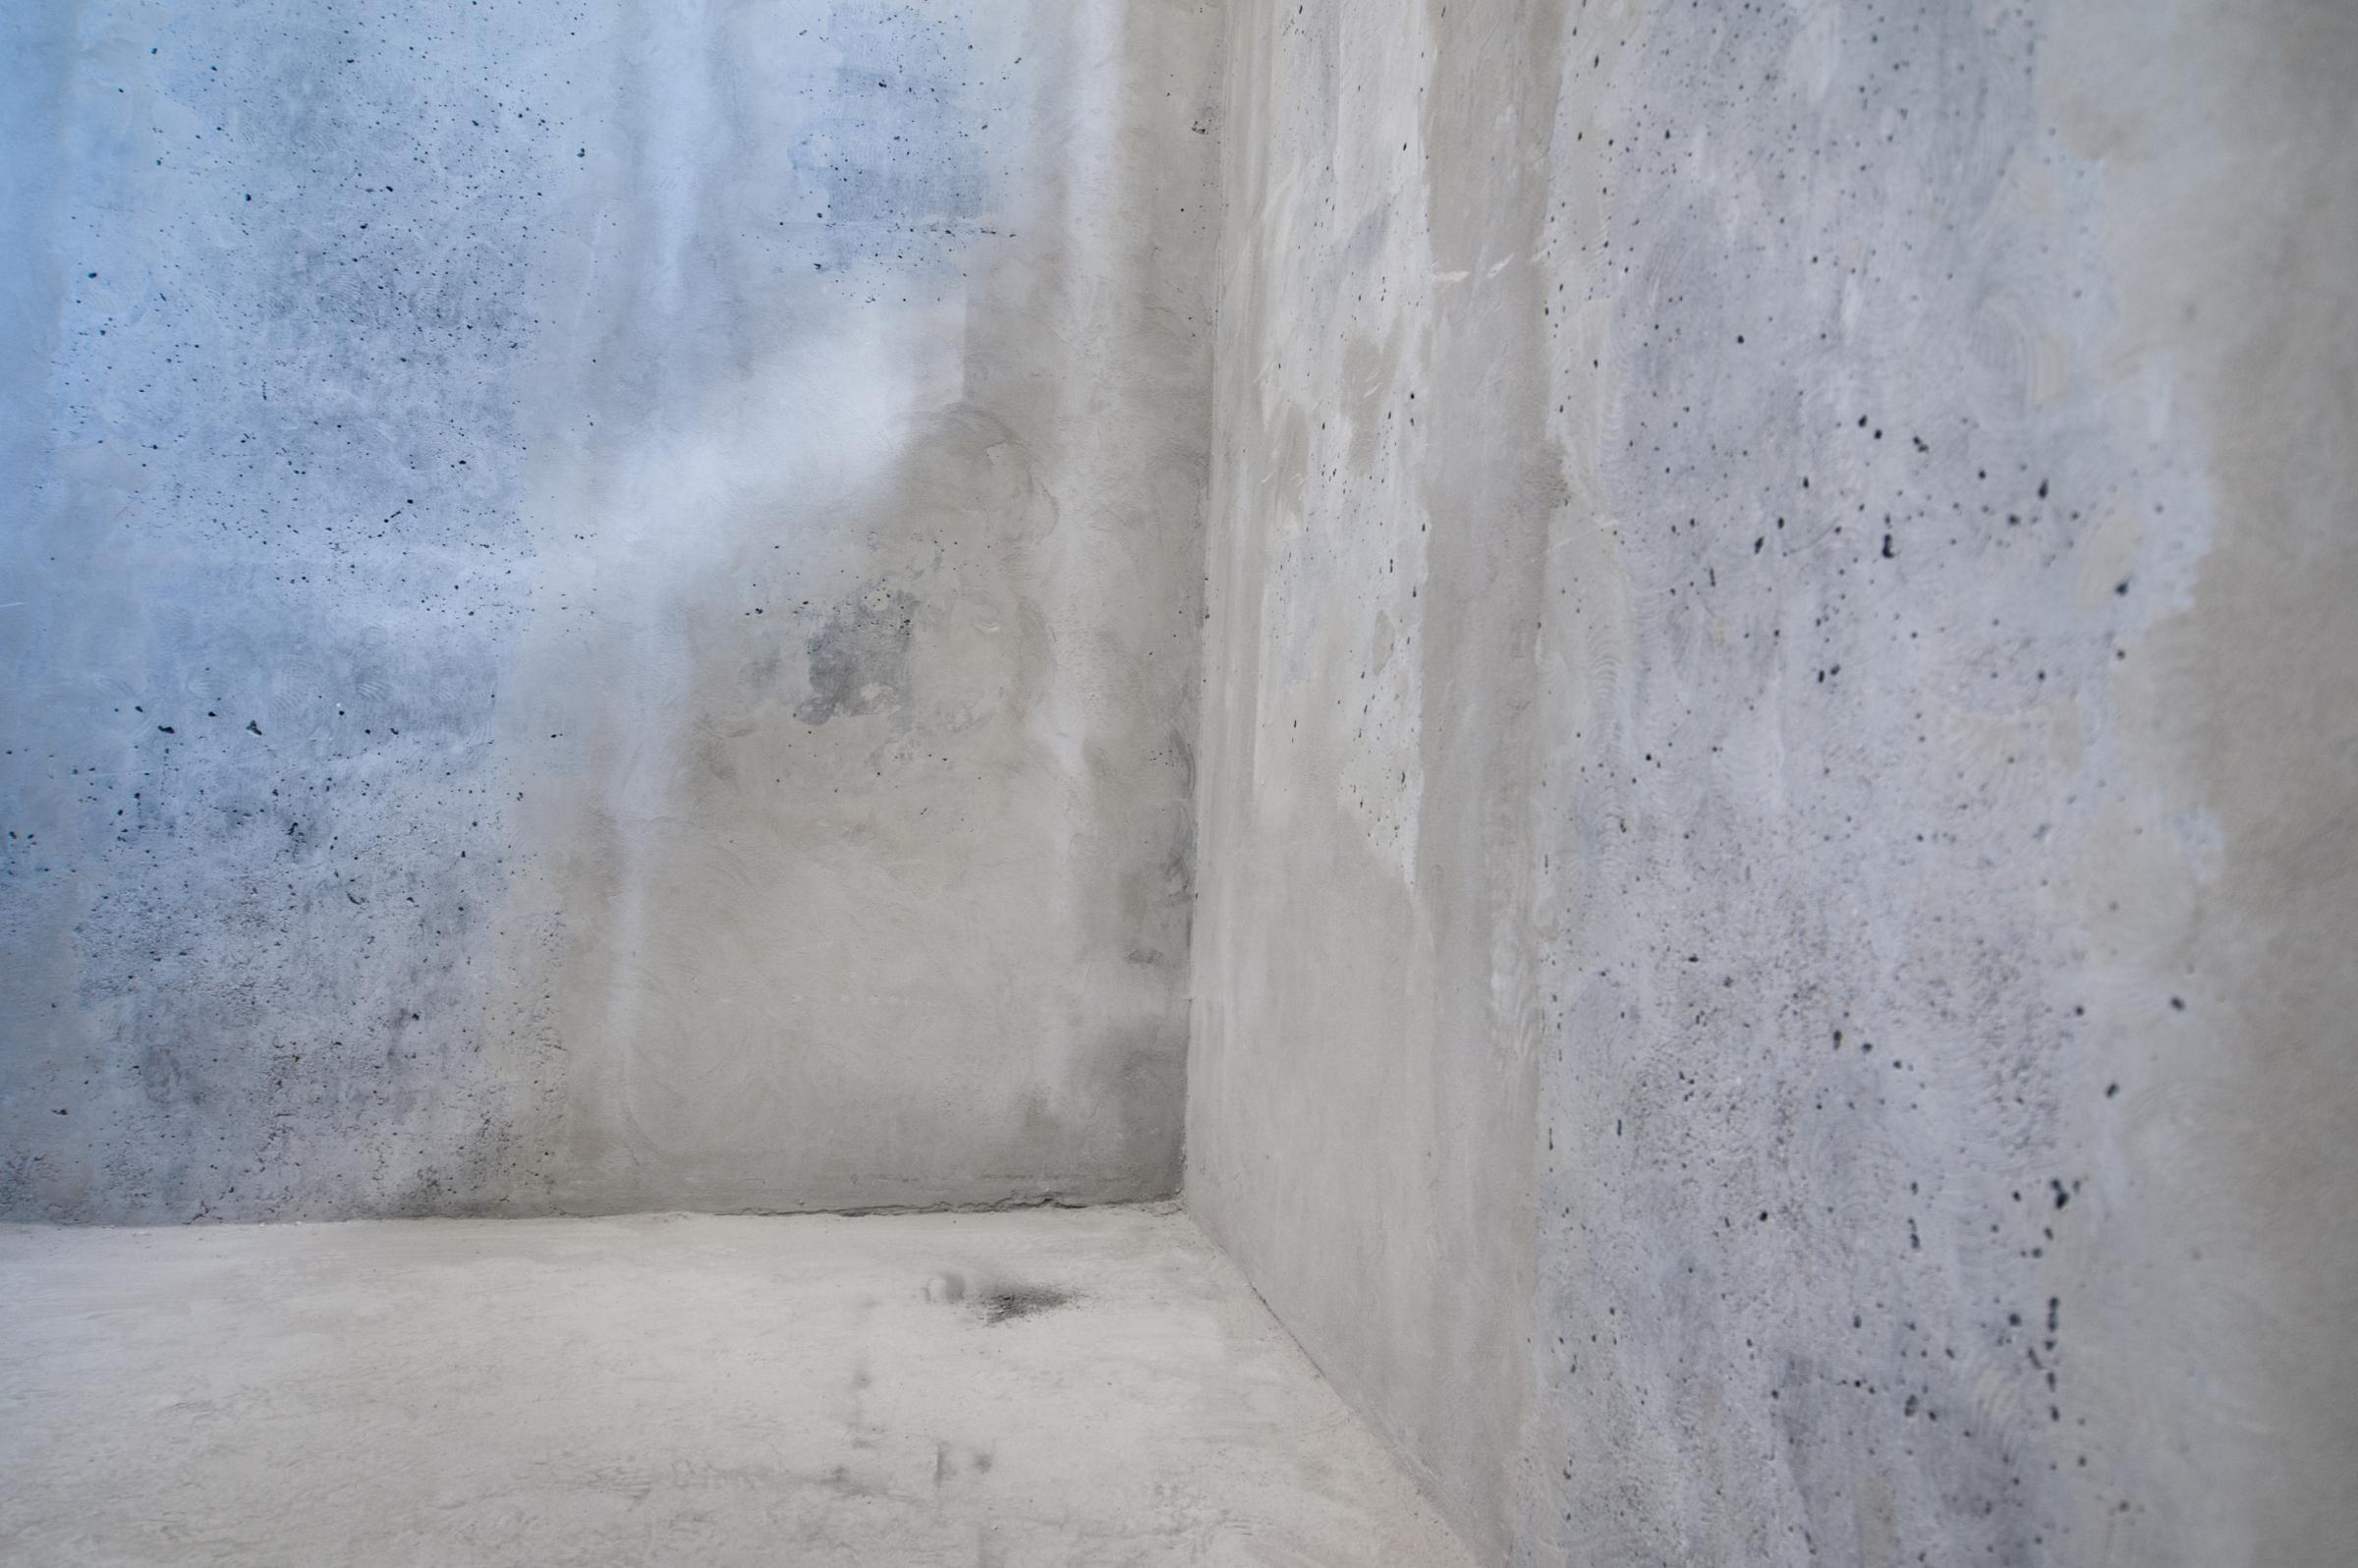 Concrete walls background, corner view.